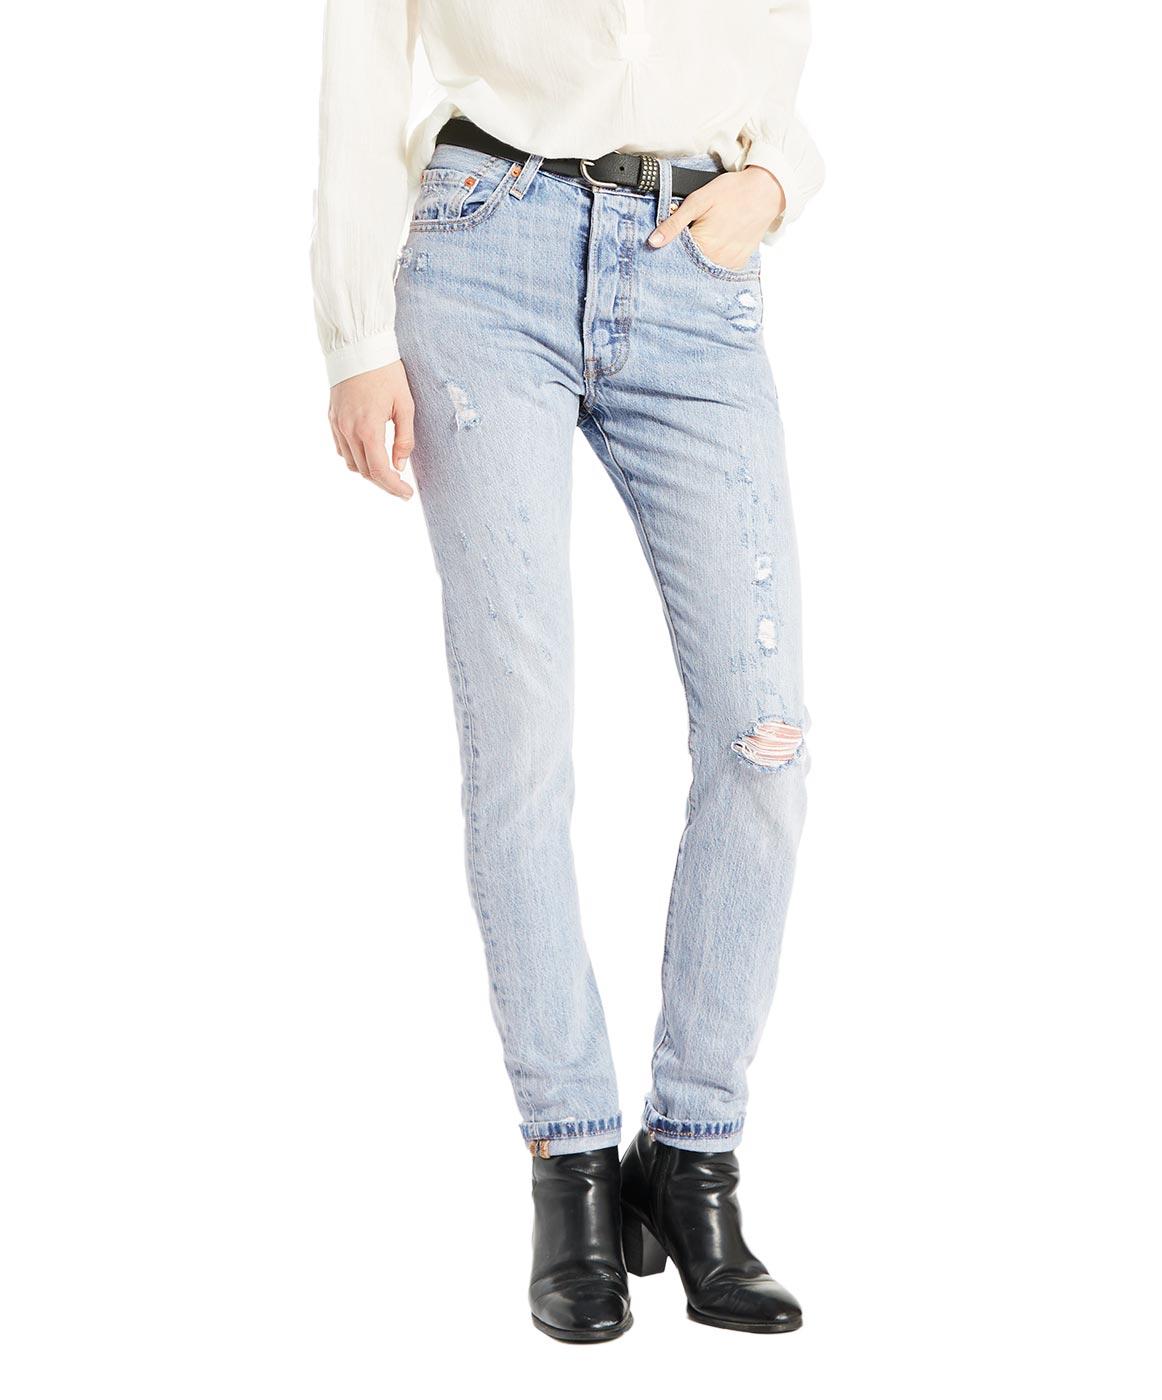 Hosen für Frauen - Levi's 501 Damen Skinny Fit Clear Minds  - Onlineshop Jeans Meile